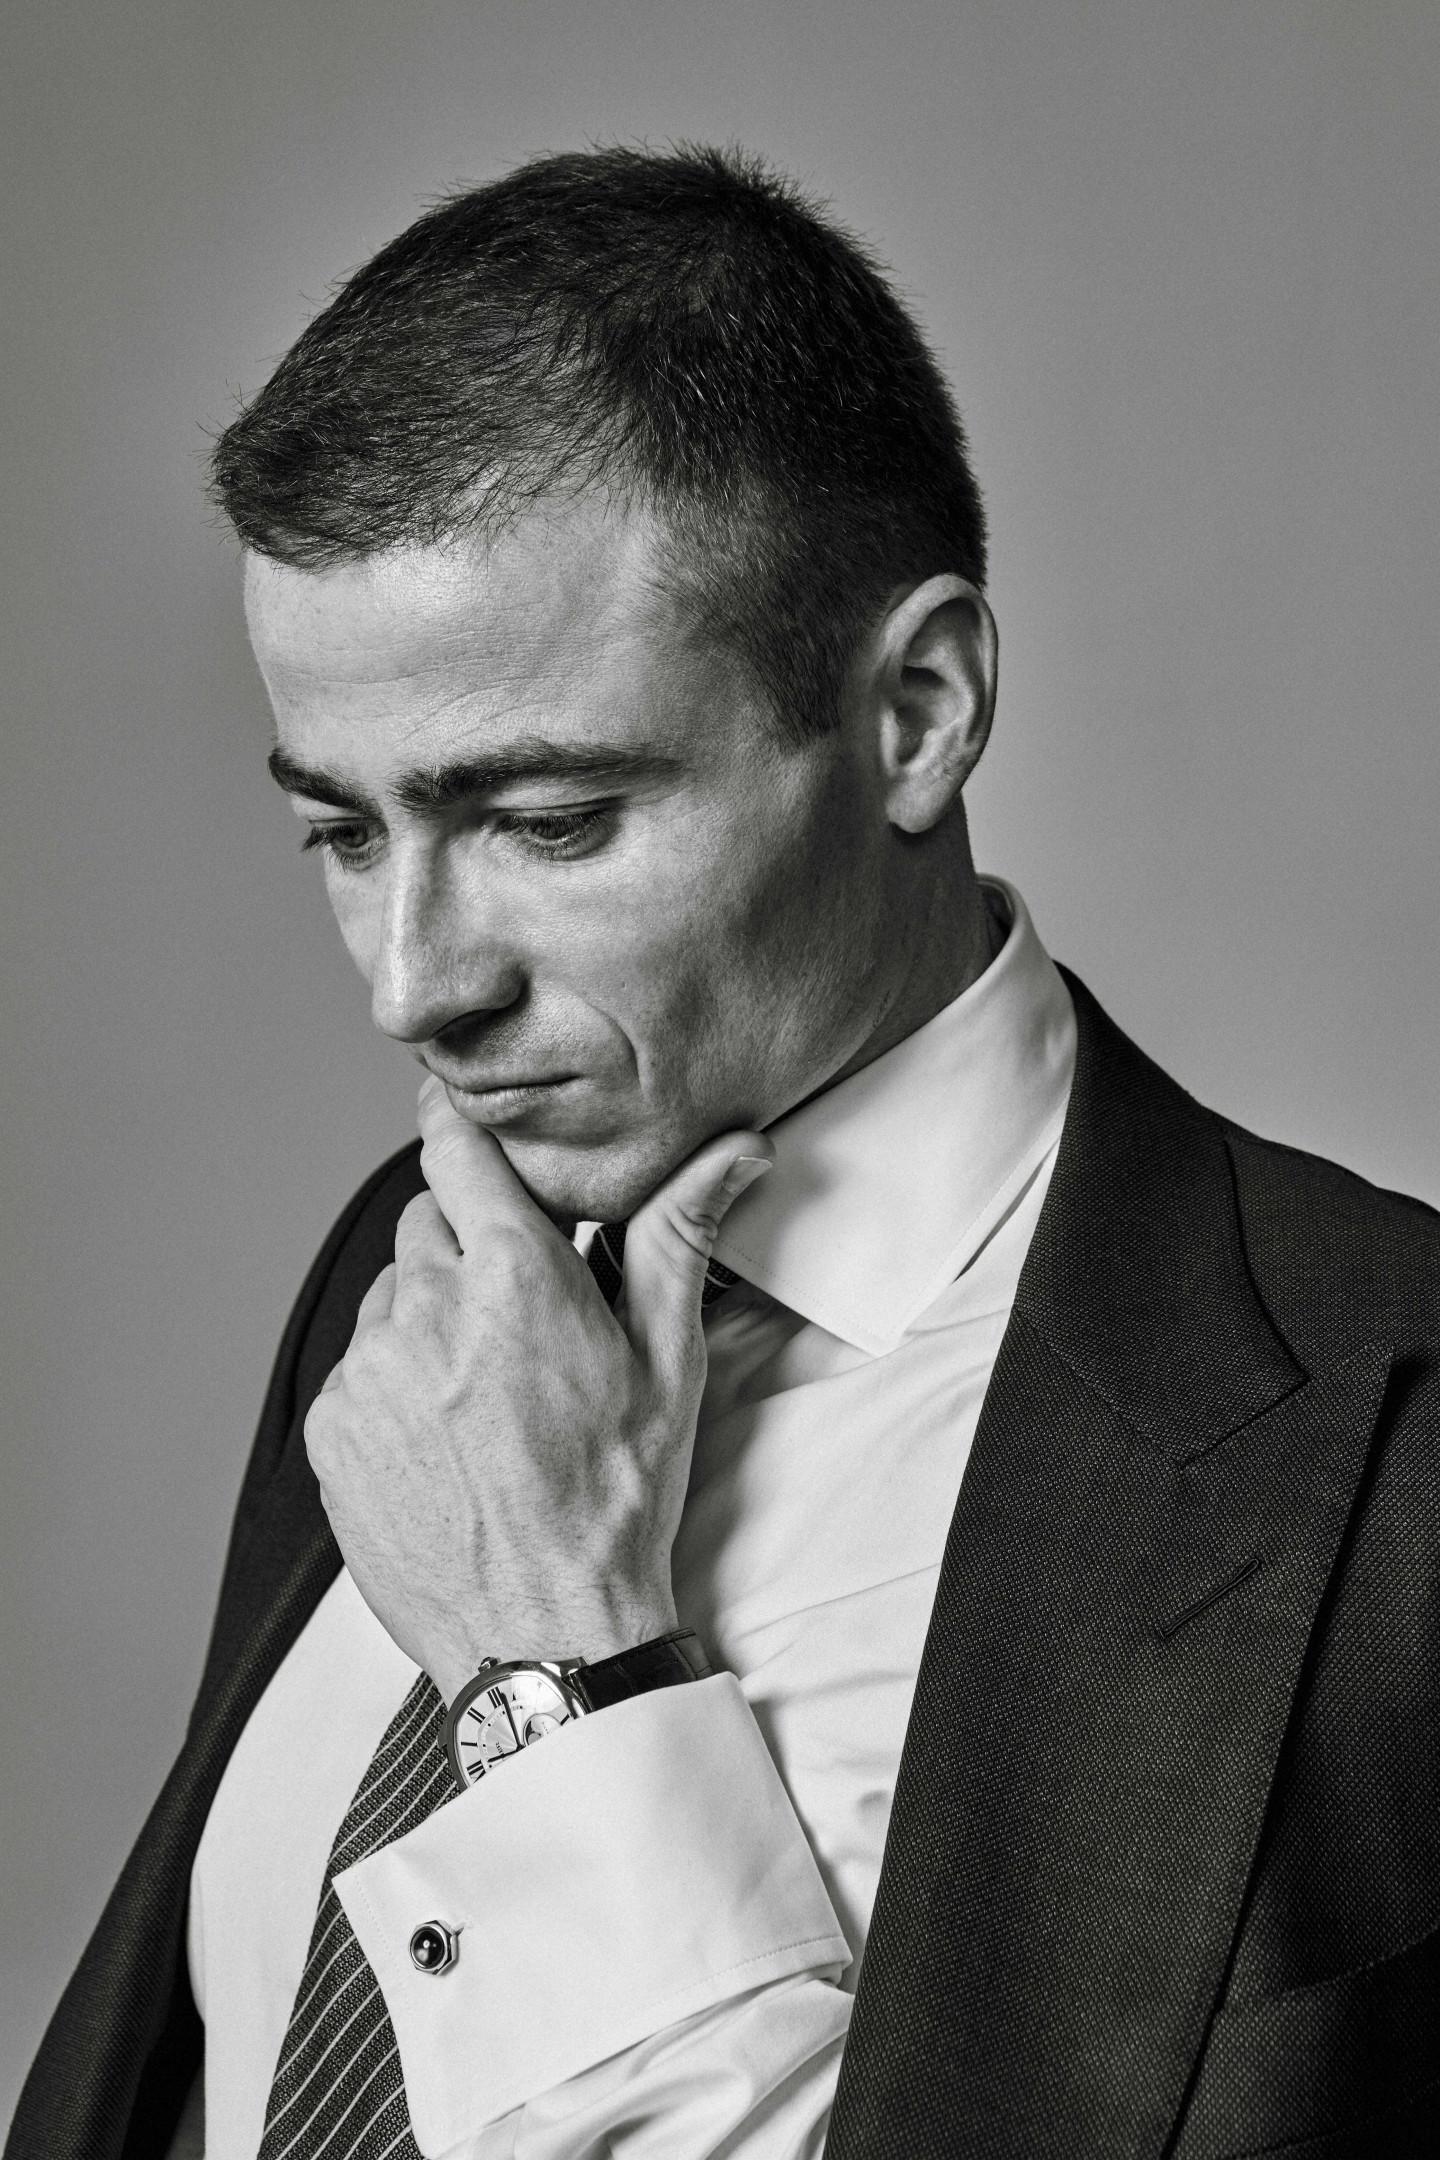 На Борисе: костюм, сорочка, галстук, платок - все Tom Ford,запонки Cartier, часы Drive de Cartier